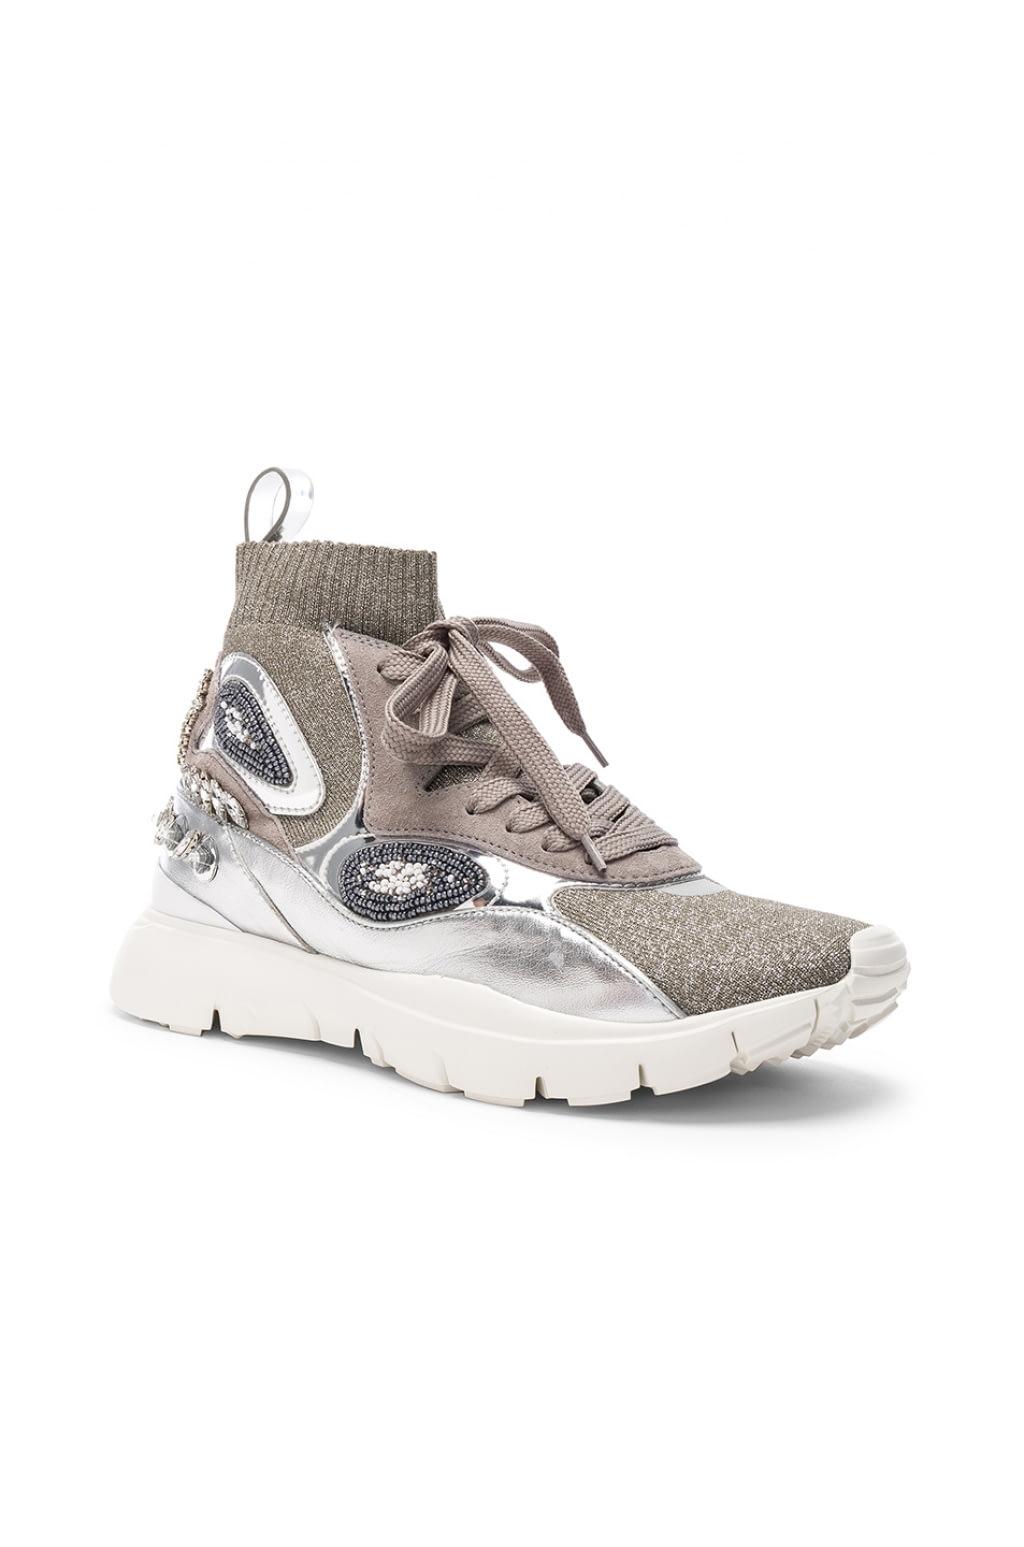 Valentino Heroes Her Embellished High Top Sneakers in Metallics. LiXbcL